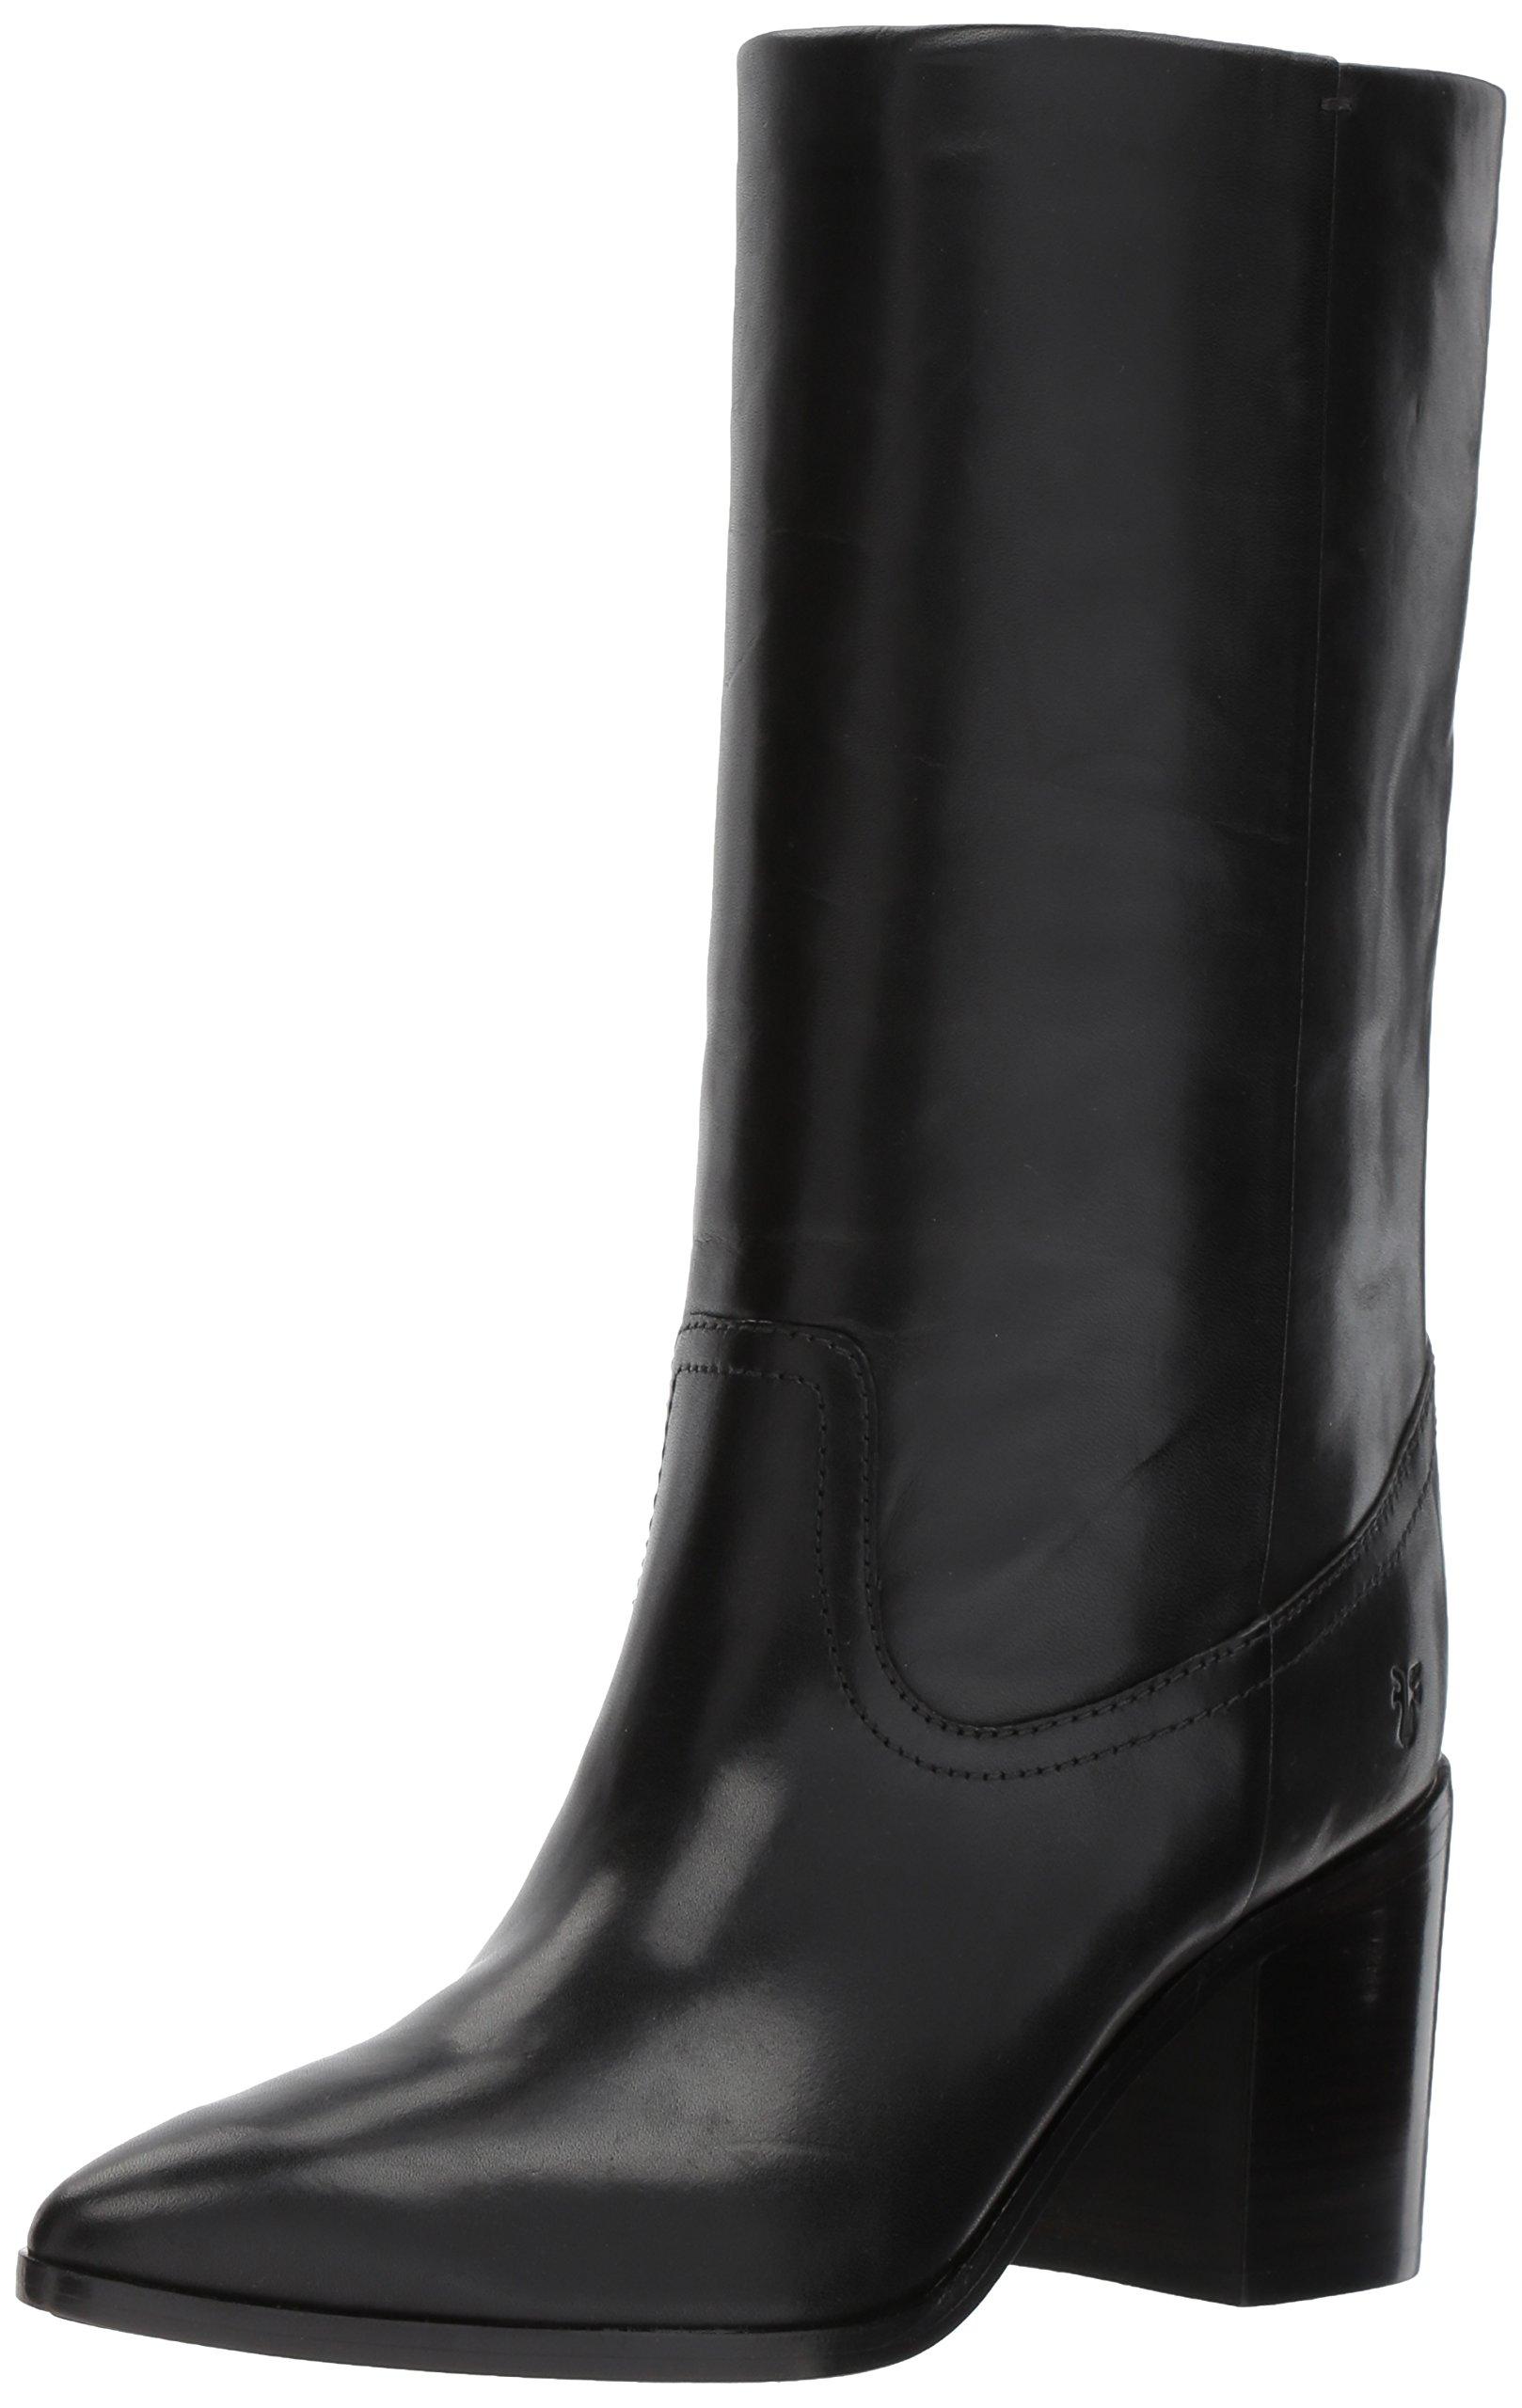 FRYE Women's Flynn Mid Pull on Boot, Black, 10 M US